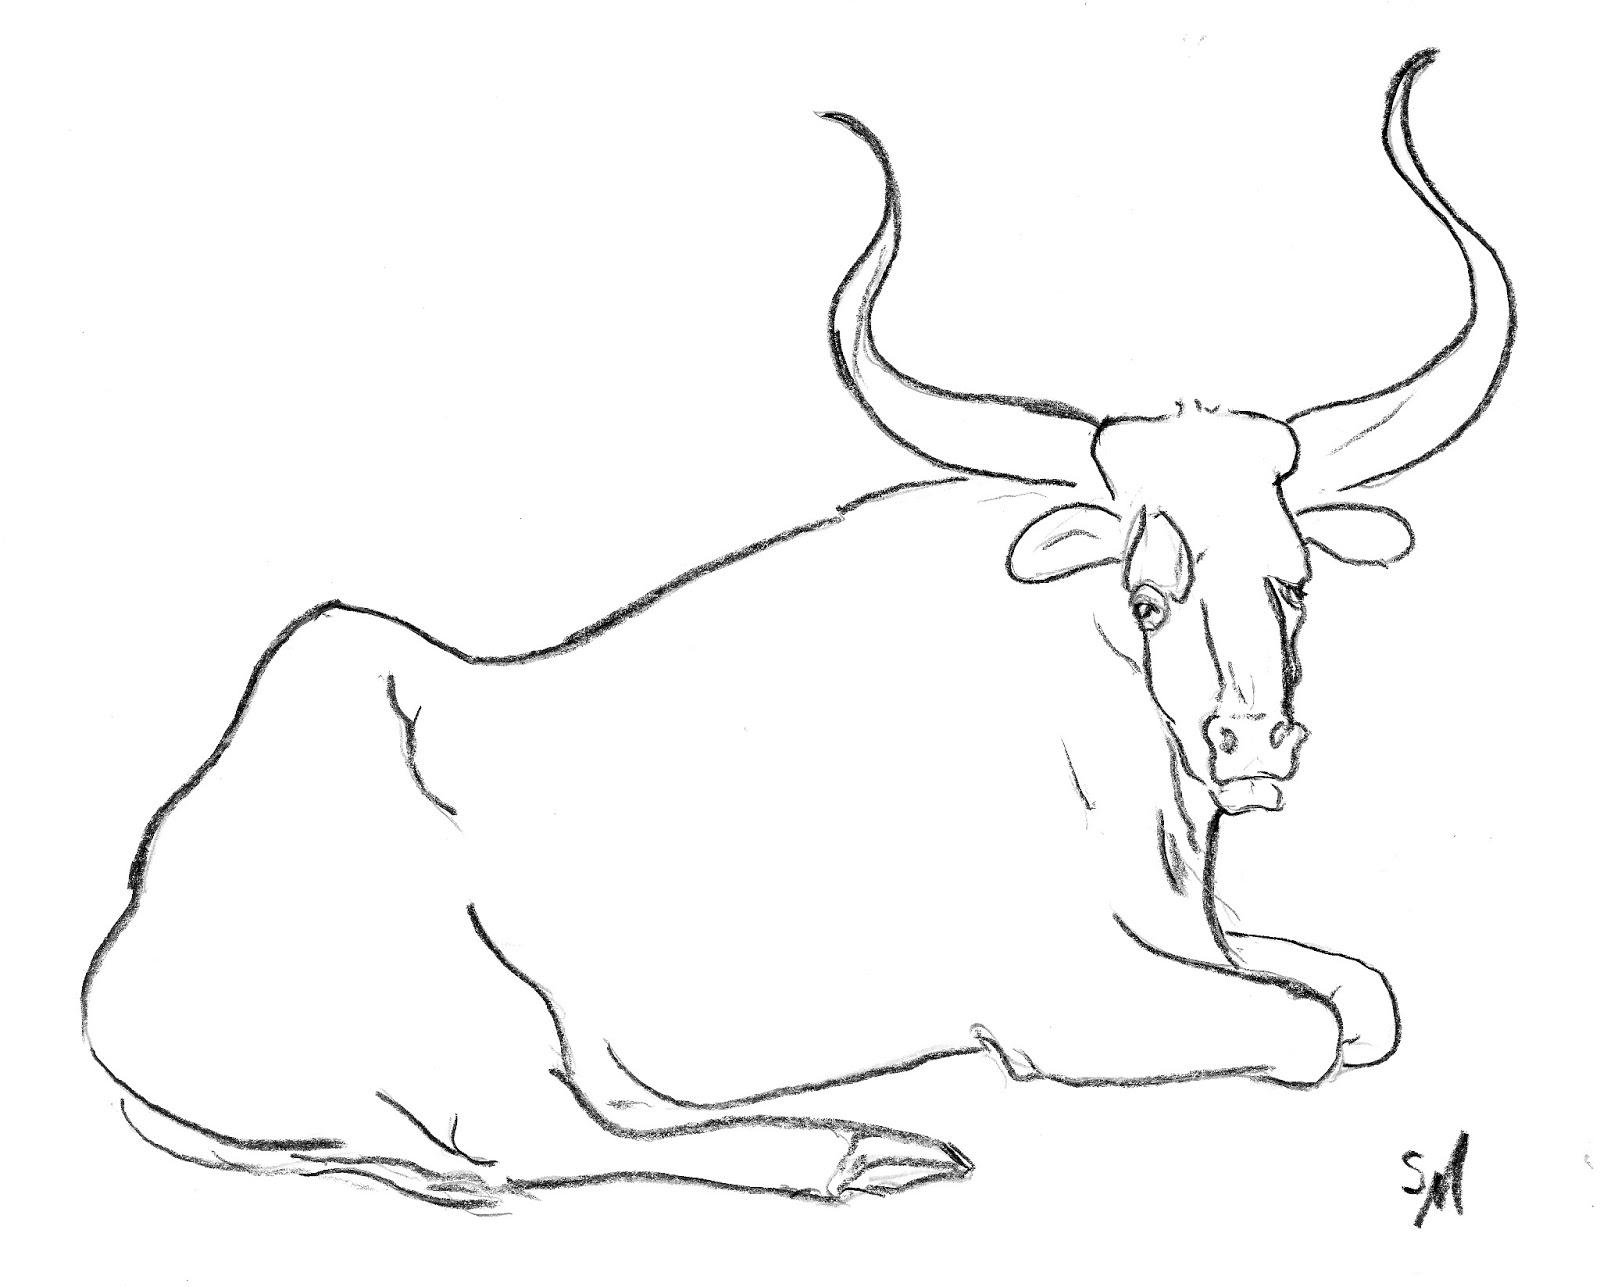 Drawn ox Realistic Ox Image Ox Drawing